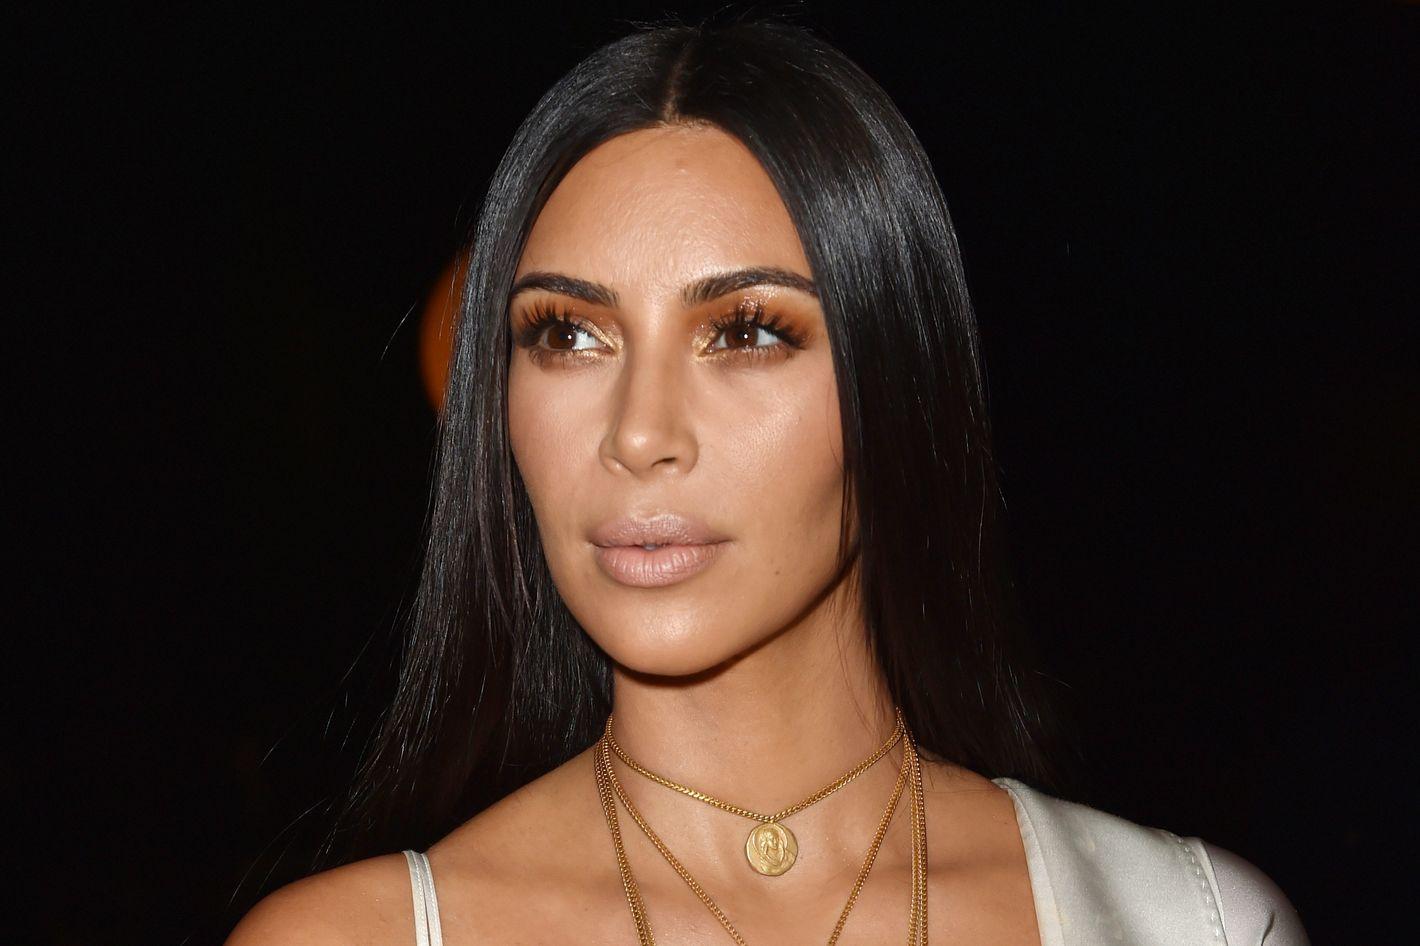 Kim Kardashian Robbed ... Kim Kardashian